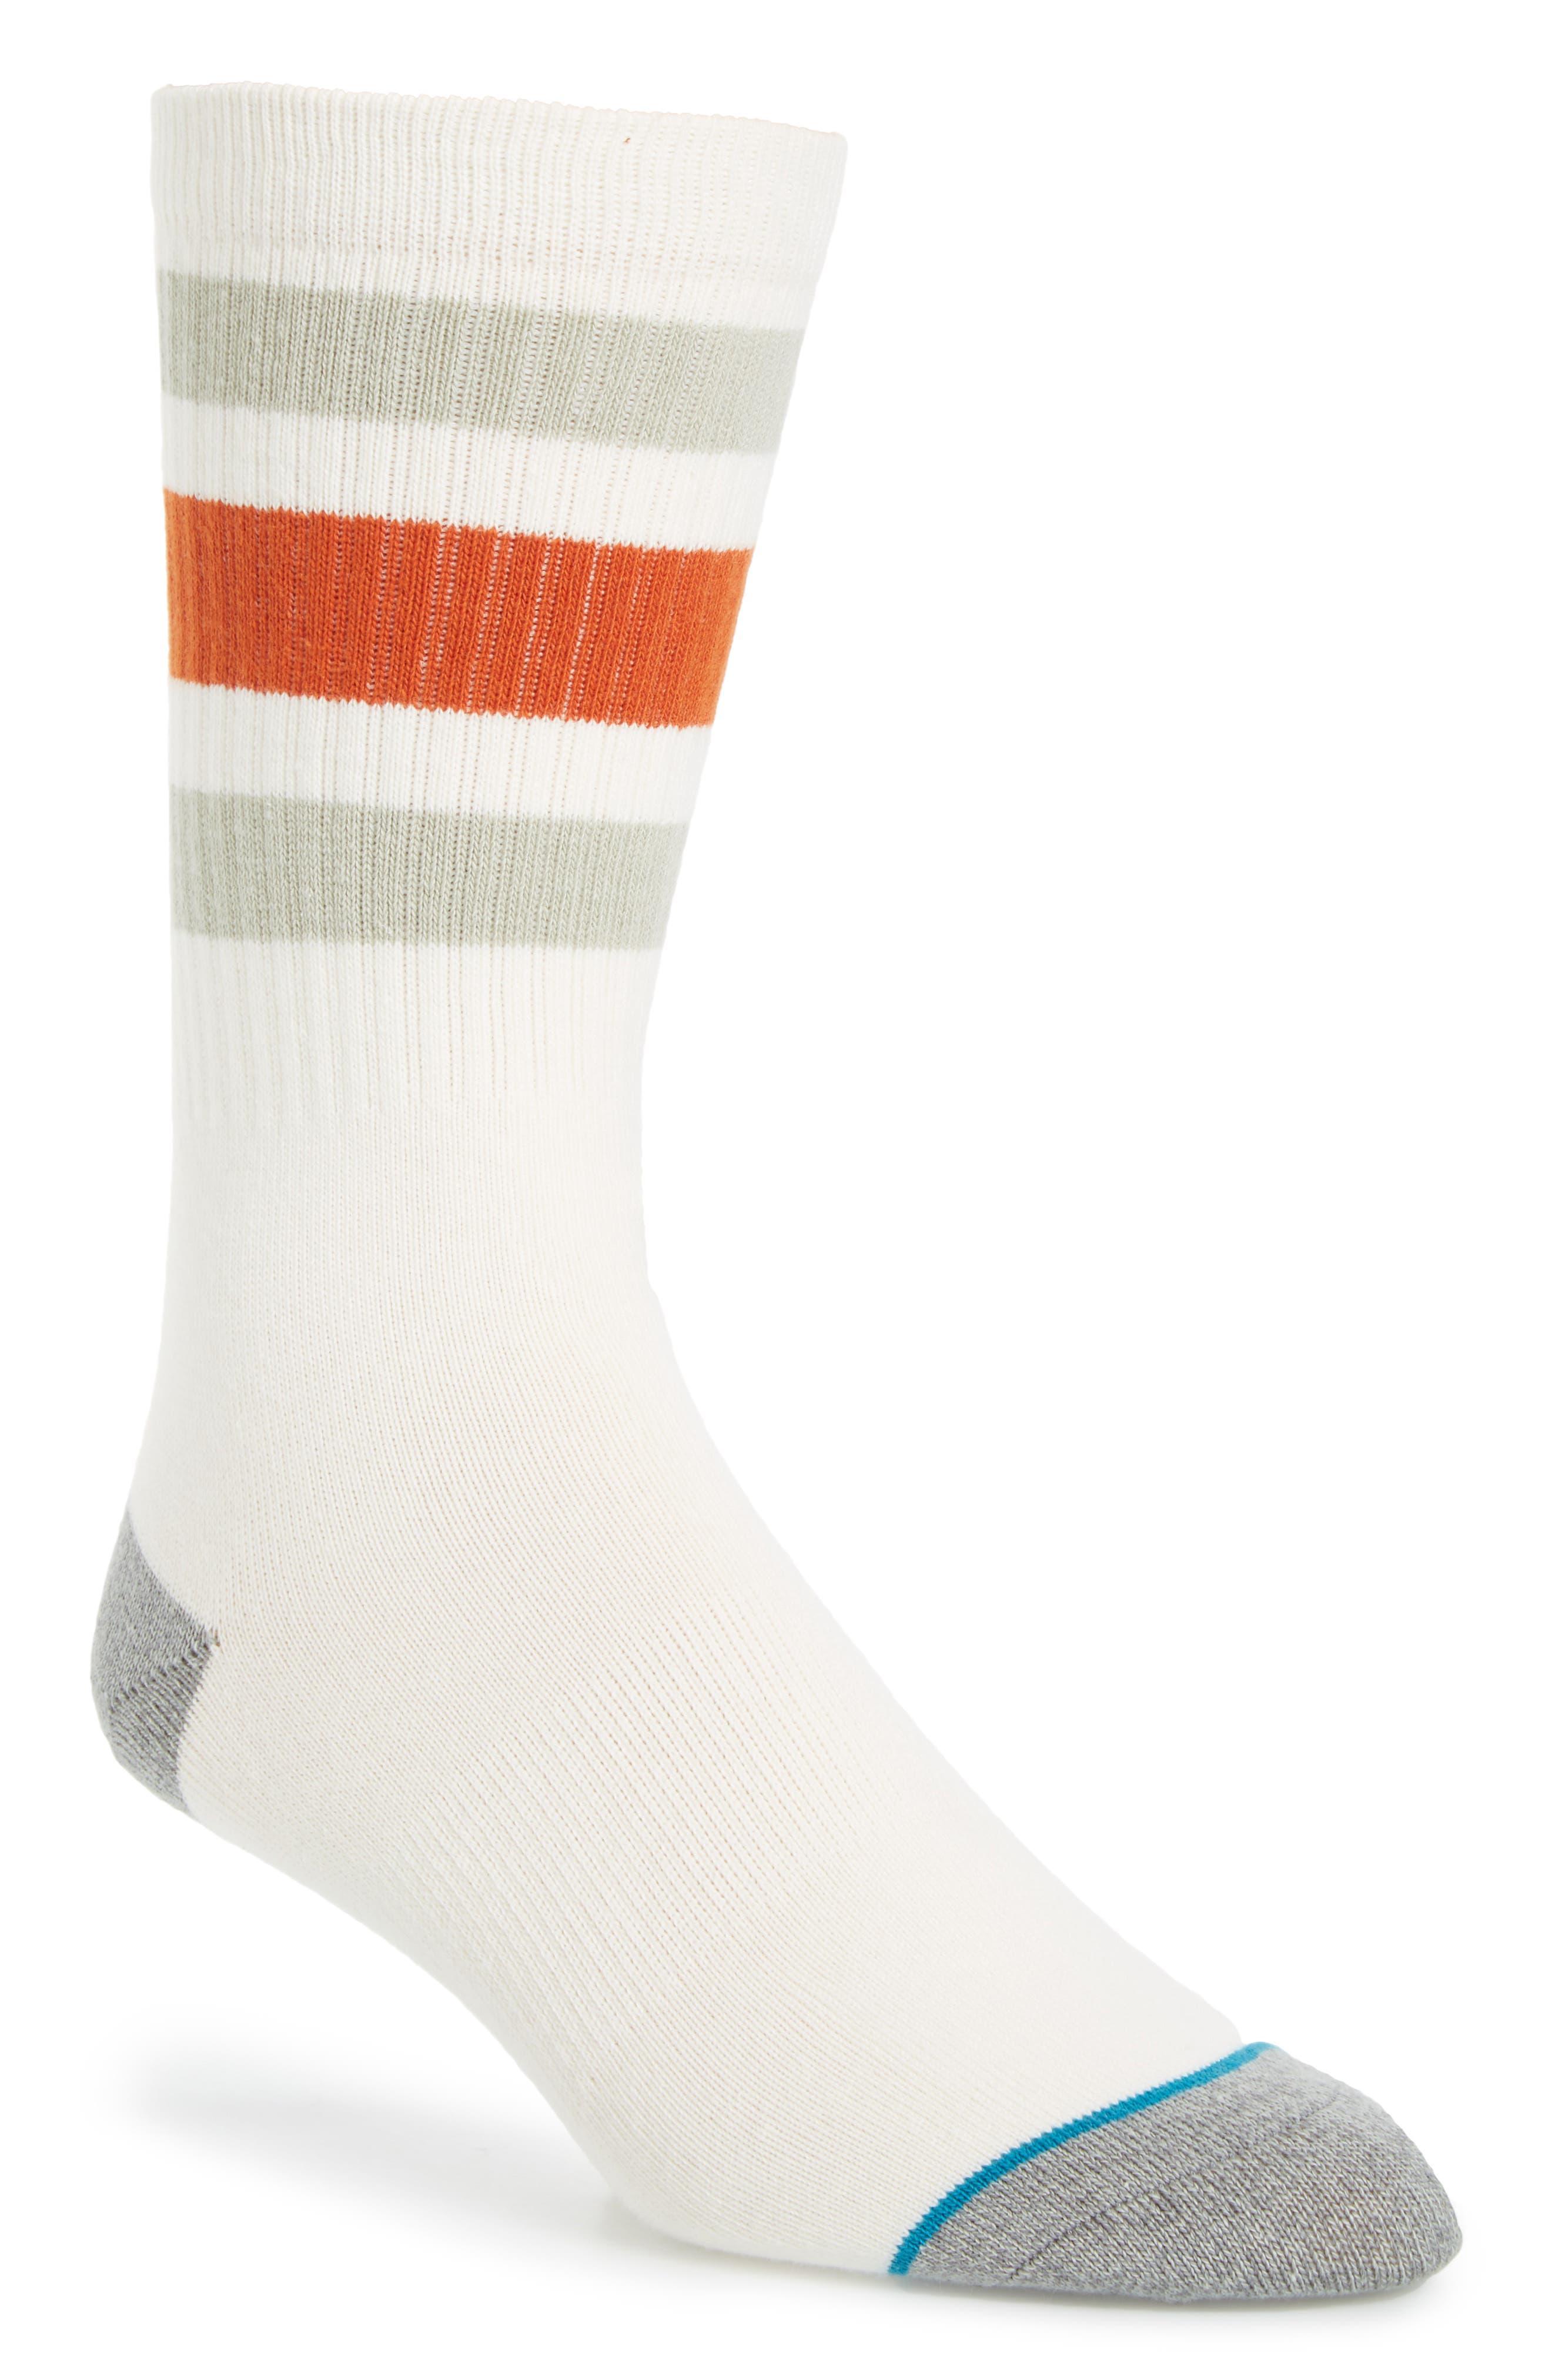 Alternate Image 1 Selected - Stance Stripe Crew Socks